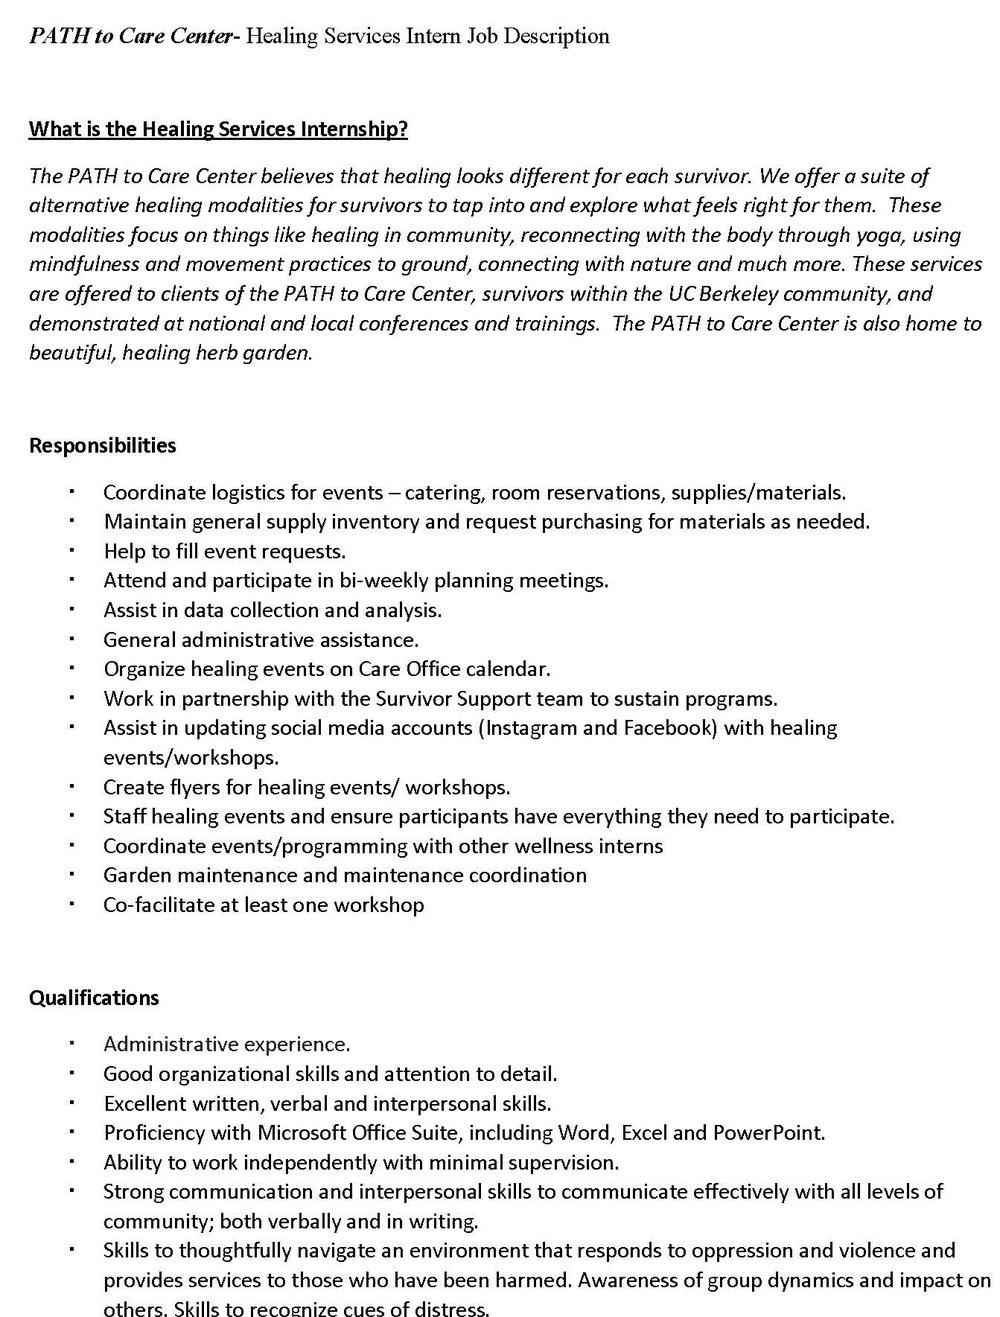 Healing Services Intern Job Description_Page_1.jpg